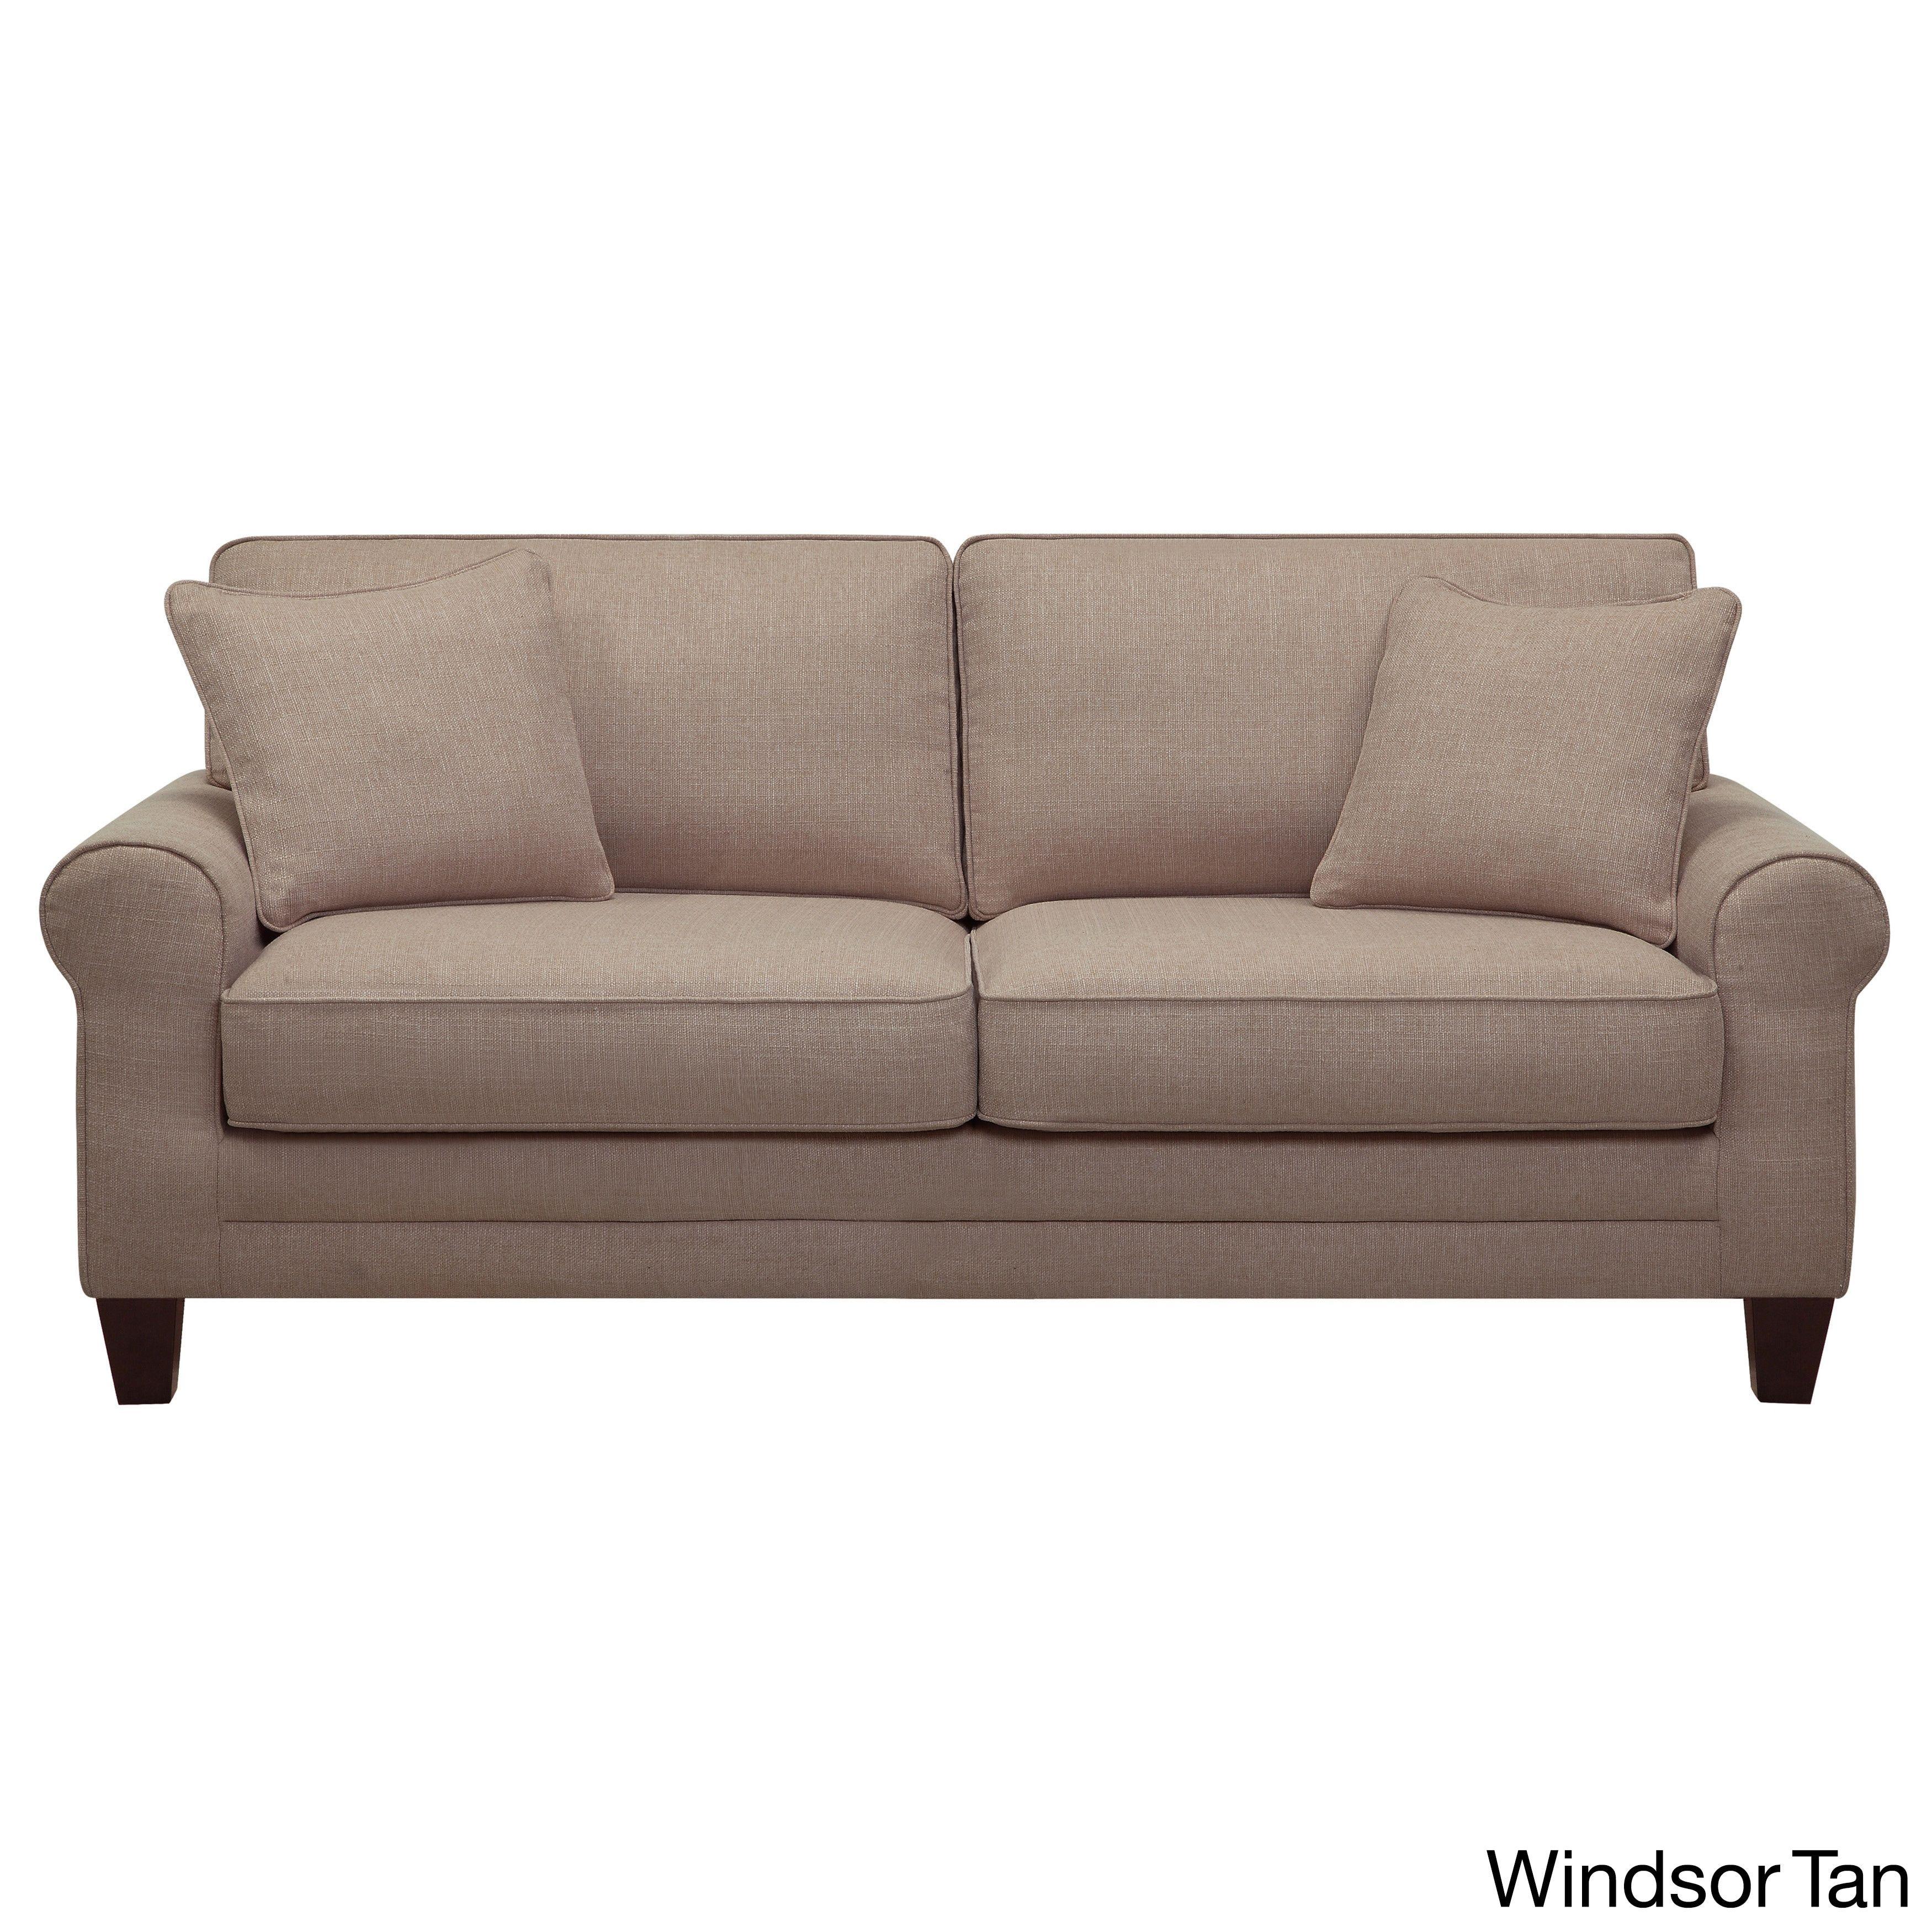 Serta Copenhagen Microfiber 73 Inch Deep Seating Sofa Windsor Tan Foam